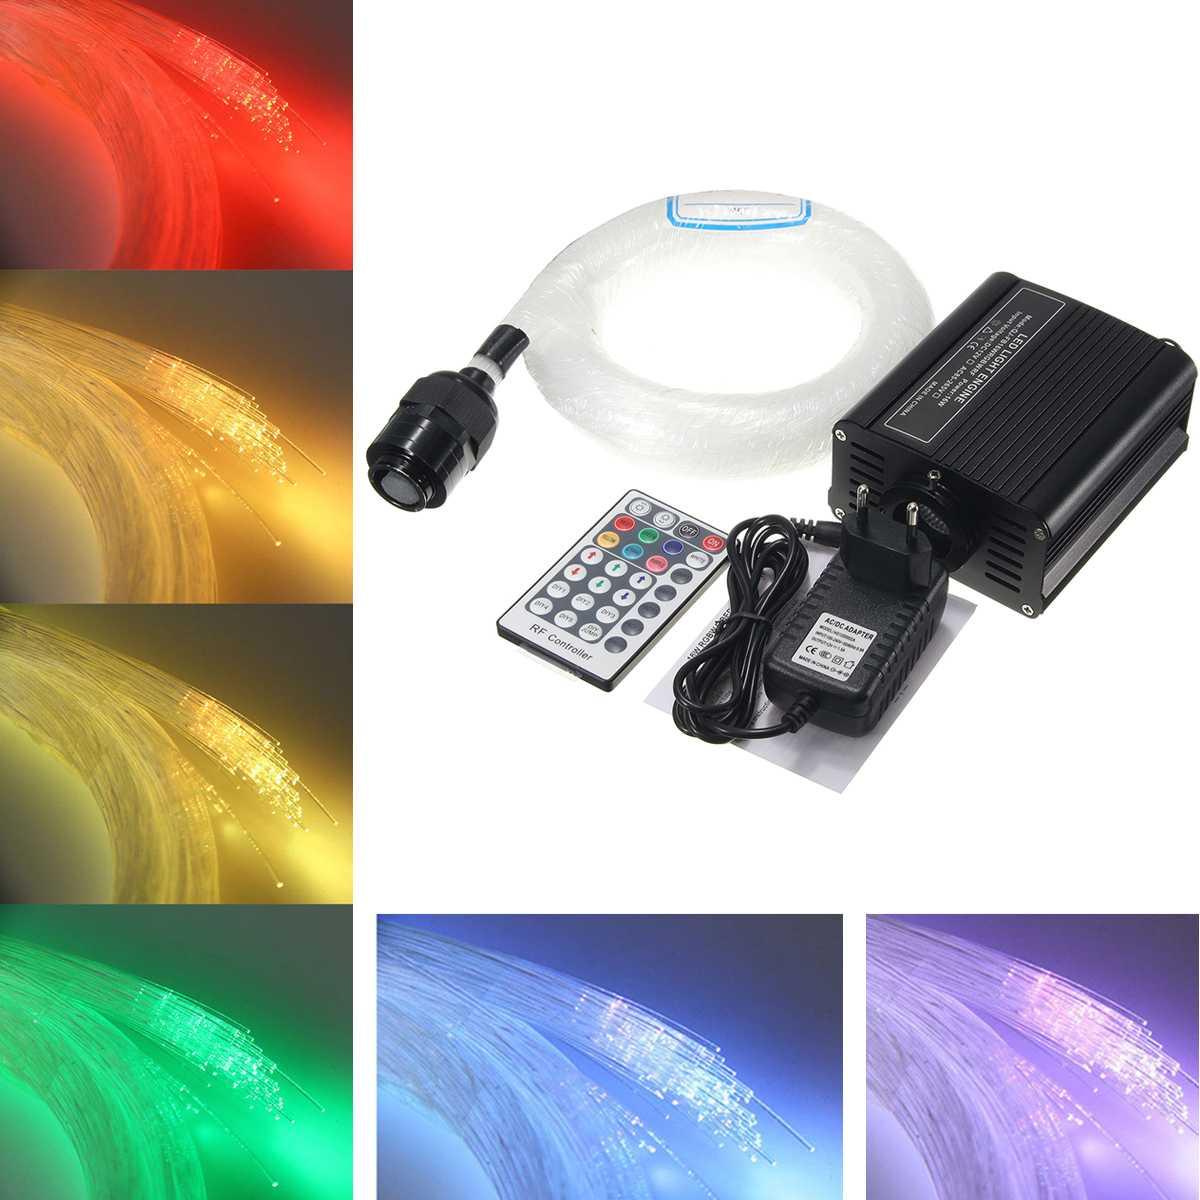 200Pcs?0.75mm?x?2m Colorful Fiber Optic Lights  RGB Twinkle LED Star Ceiling Light Kit For Fiber Optic Light  Engine Machine